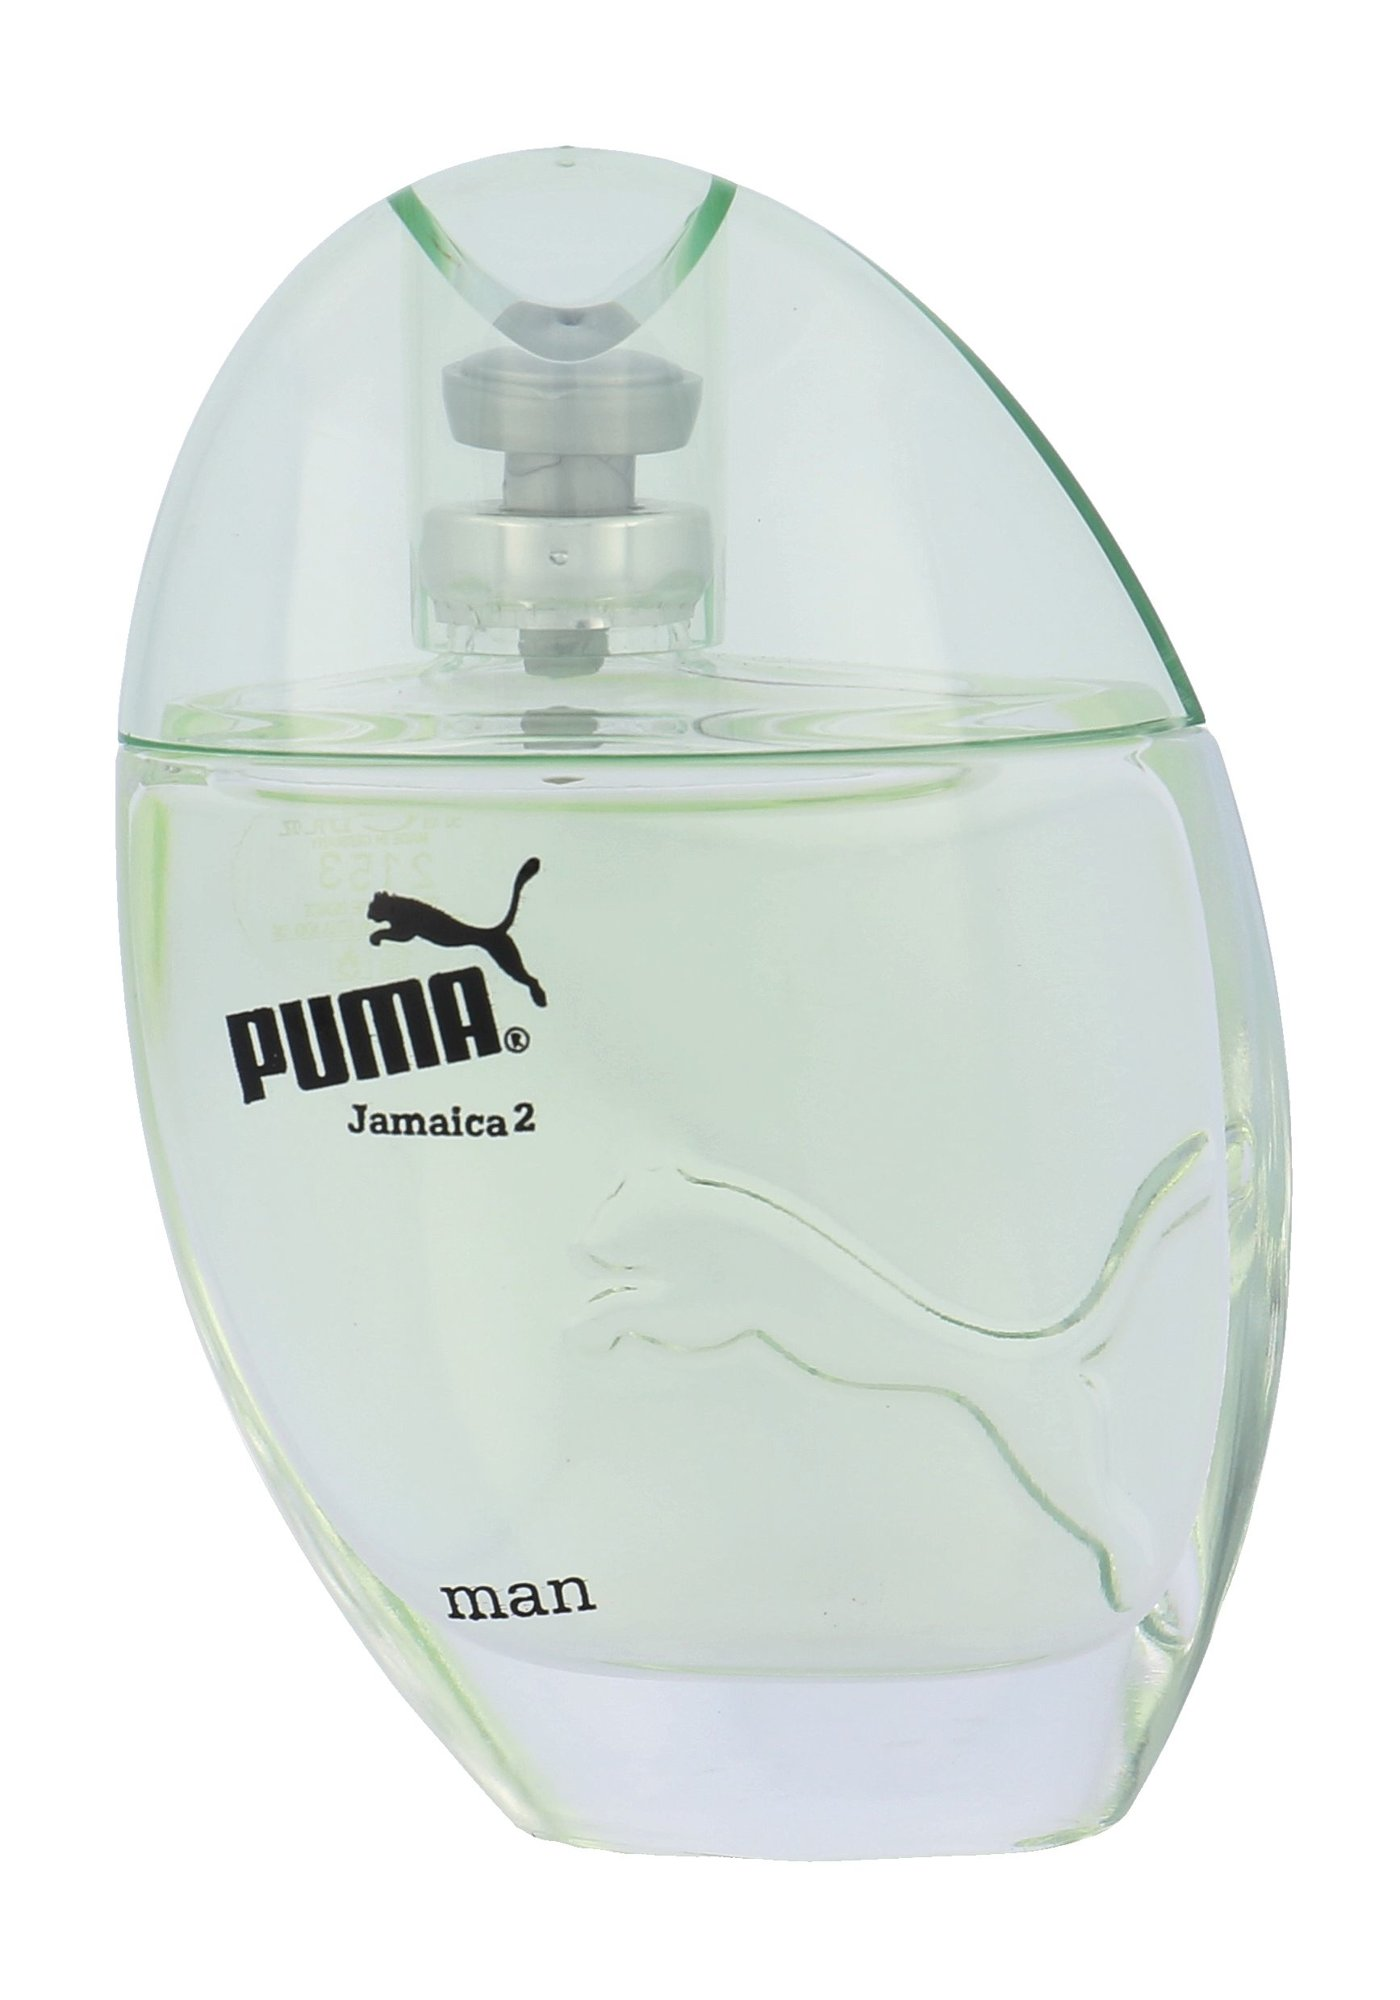 Puma Jamaica 2 Man Aftershave 50ml